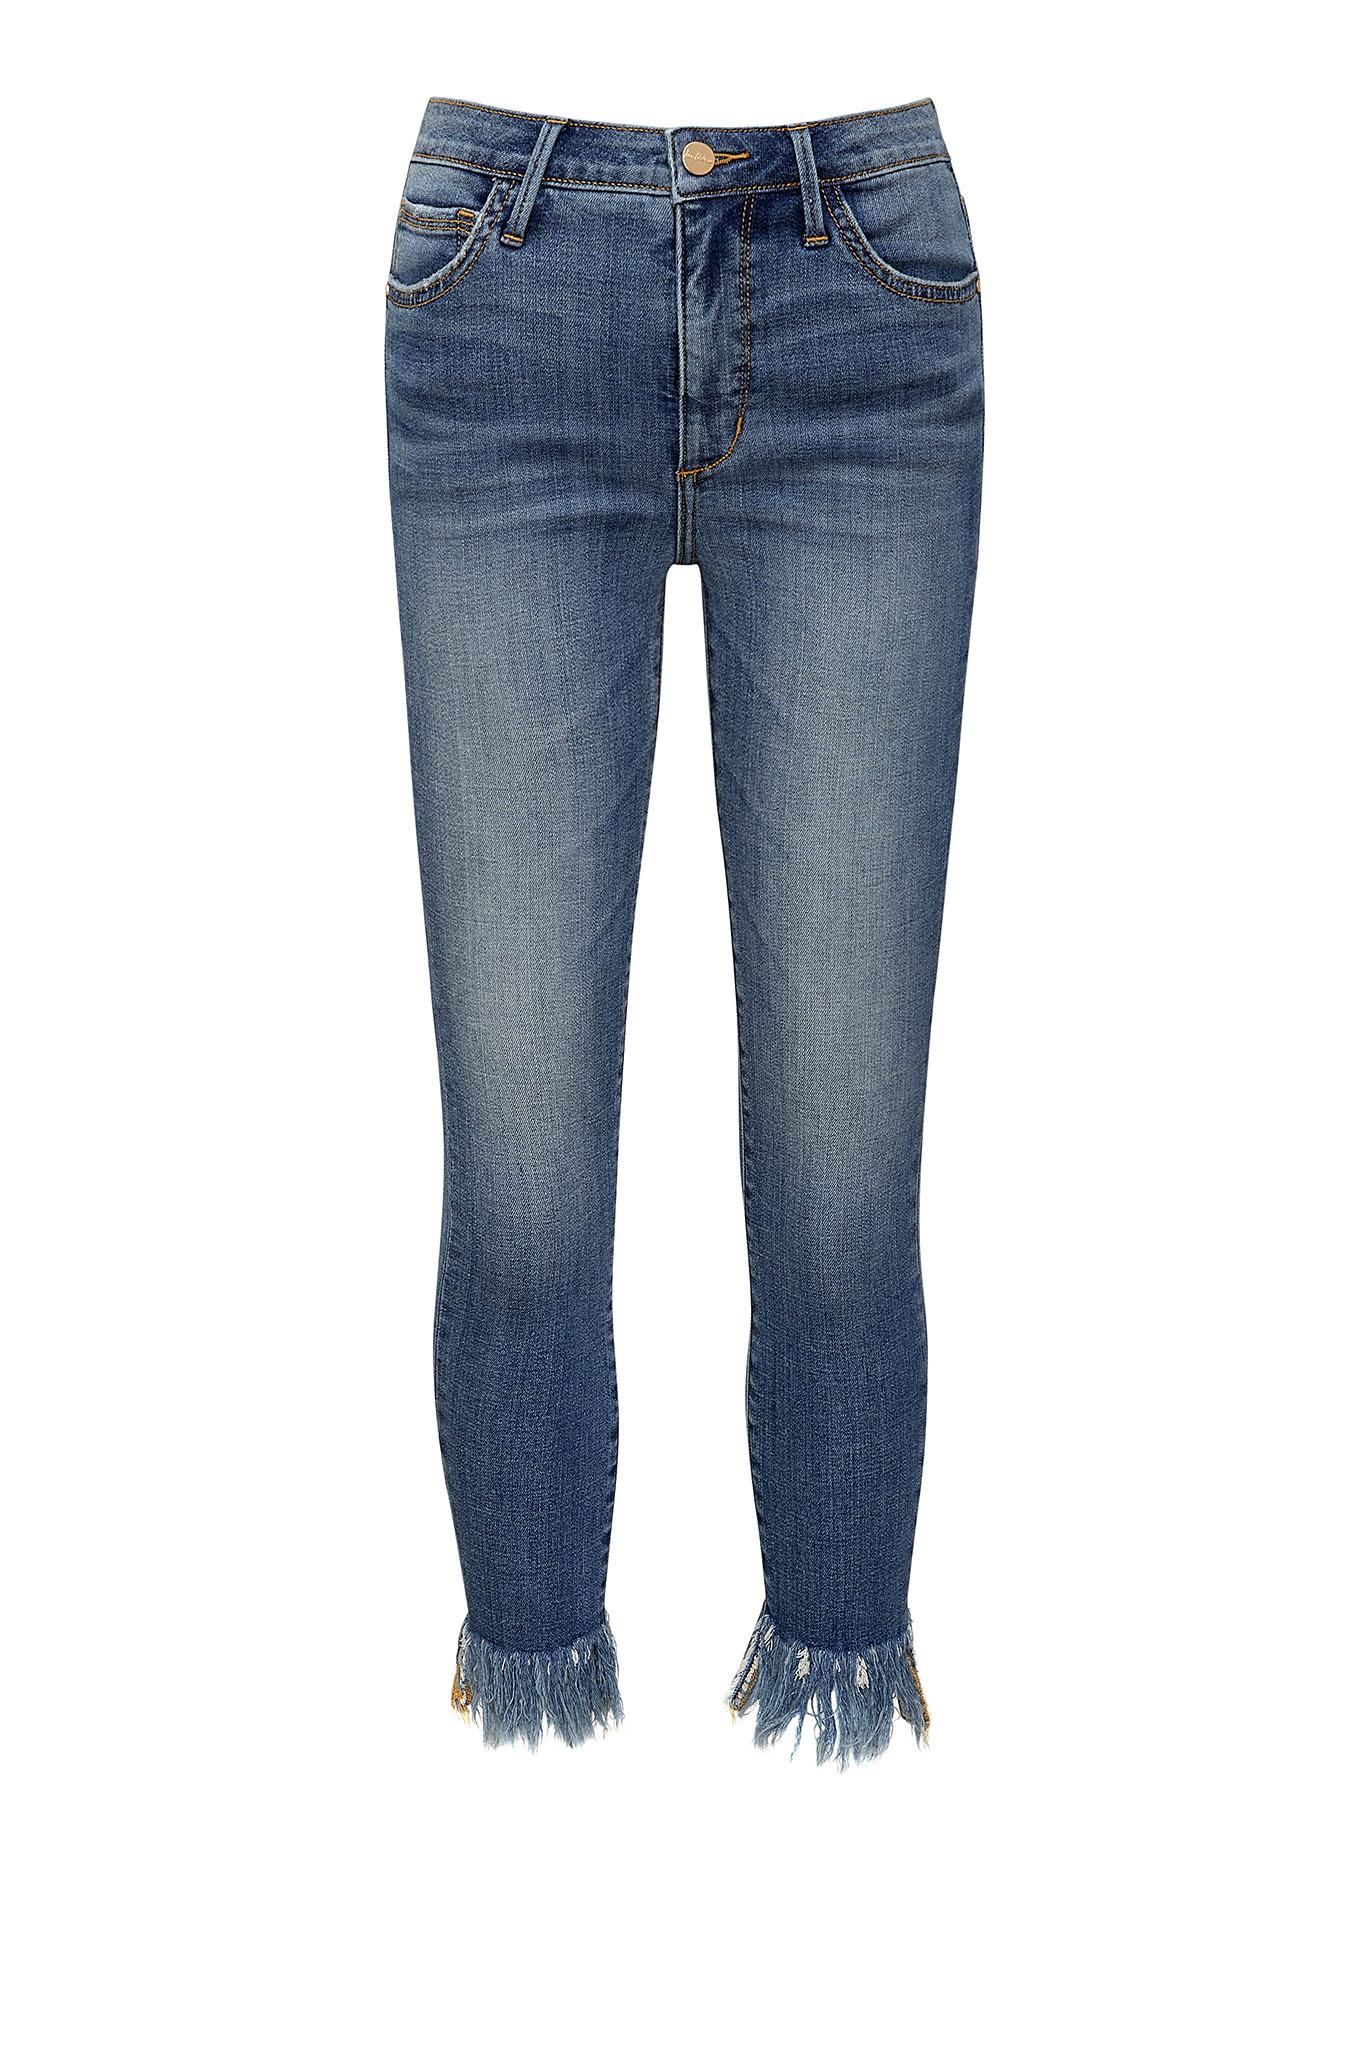 Sam Edelman jeans for spring.